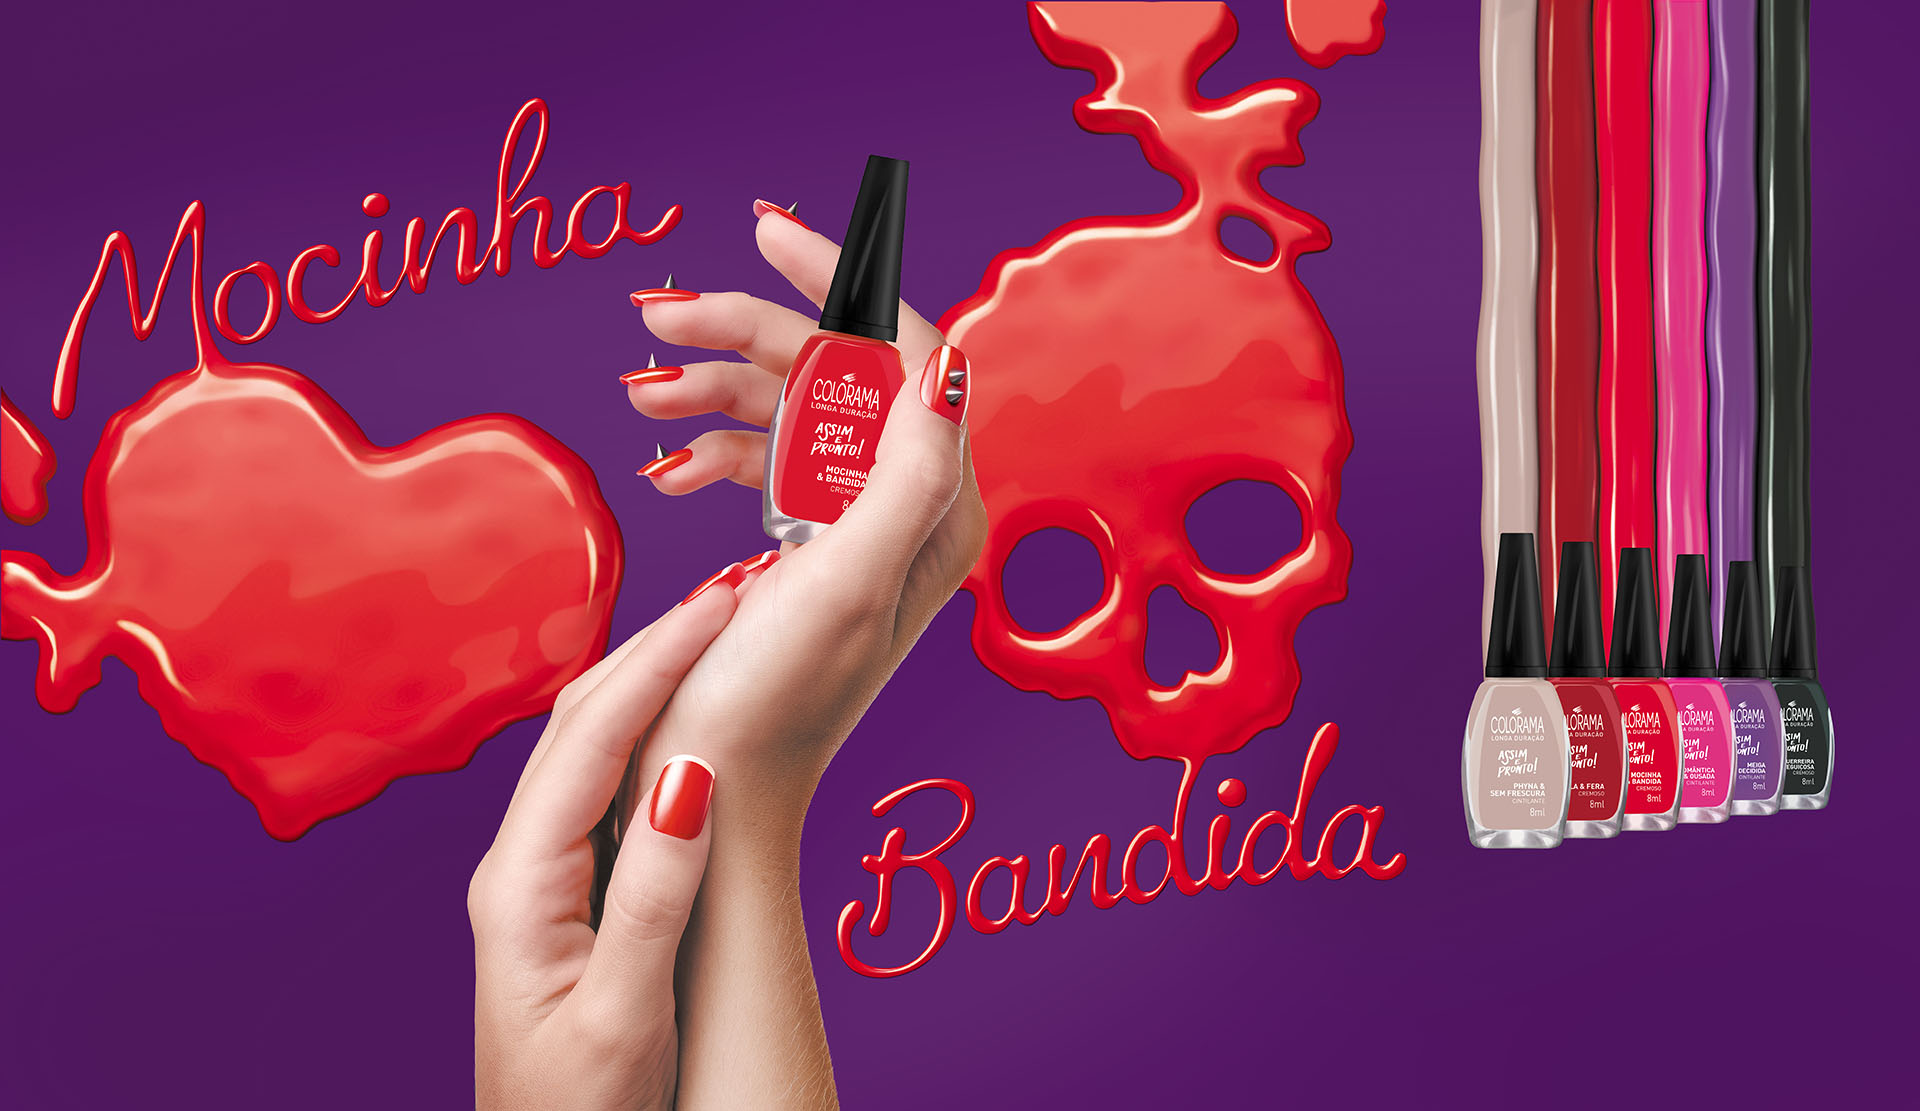 Colorama - Mocinha & Bandida